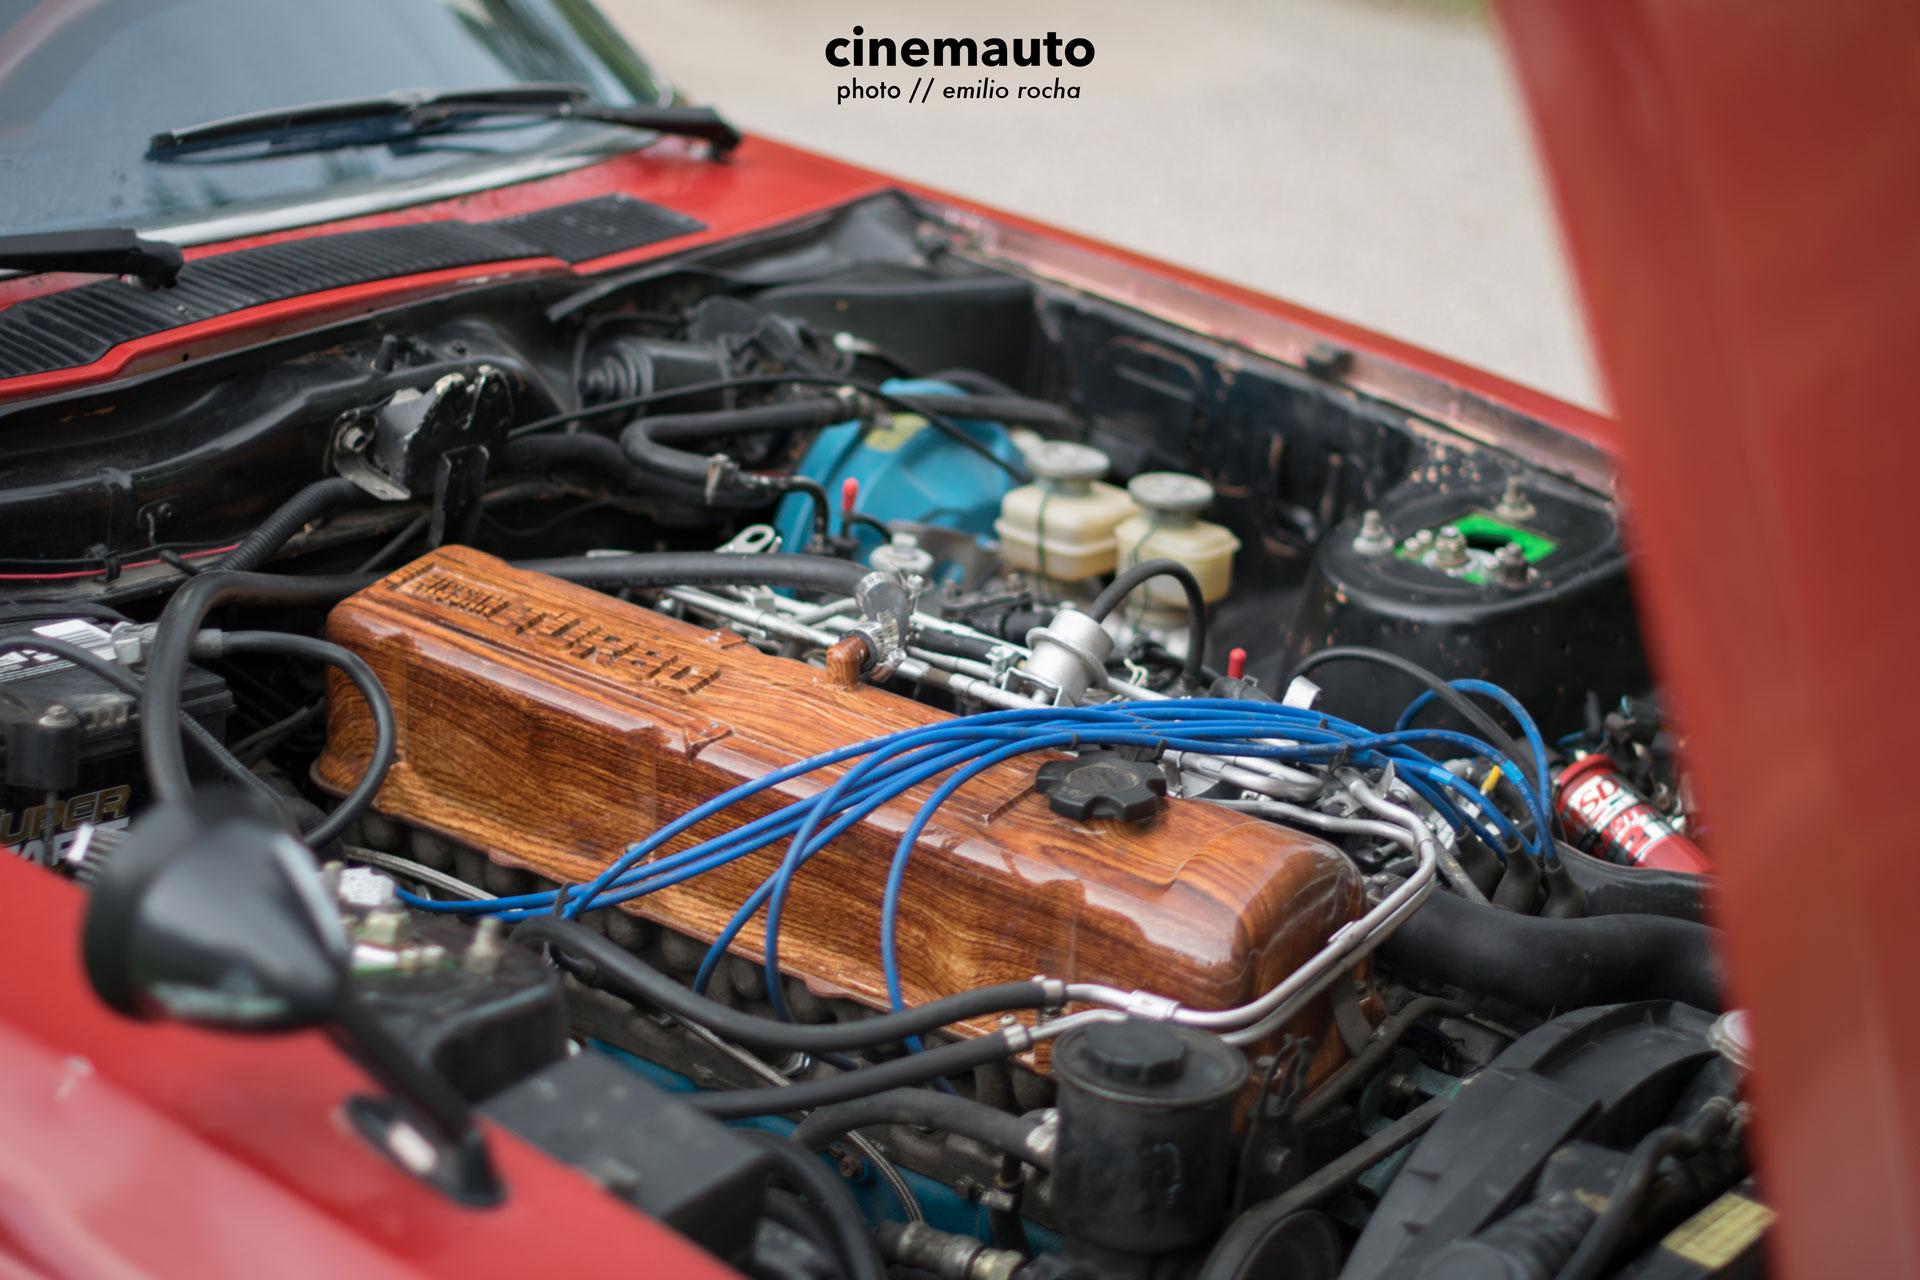 cinemauto-kansas-automotive-photography-datsun15.jpg